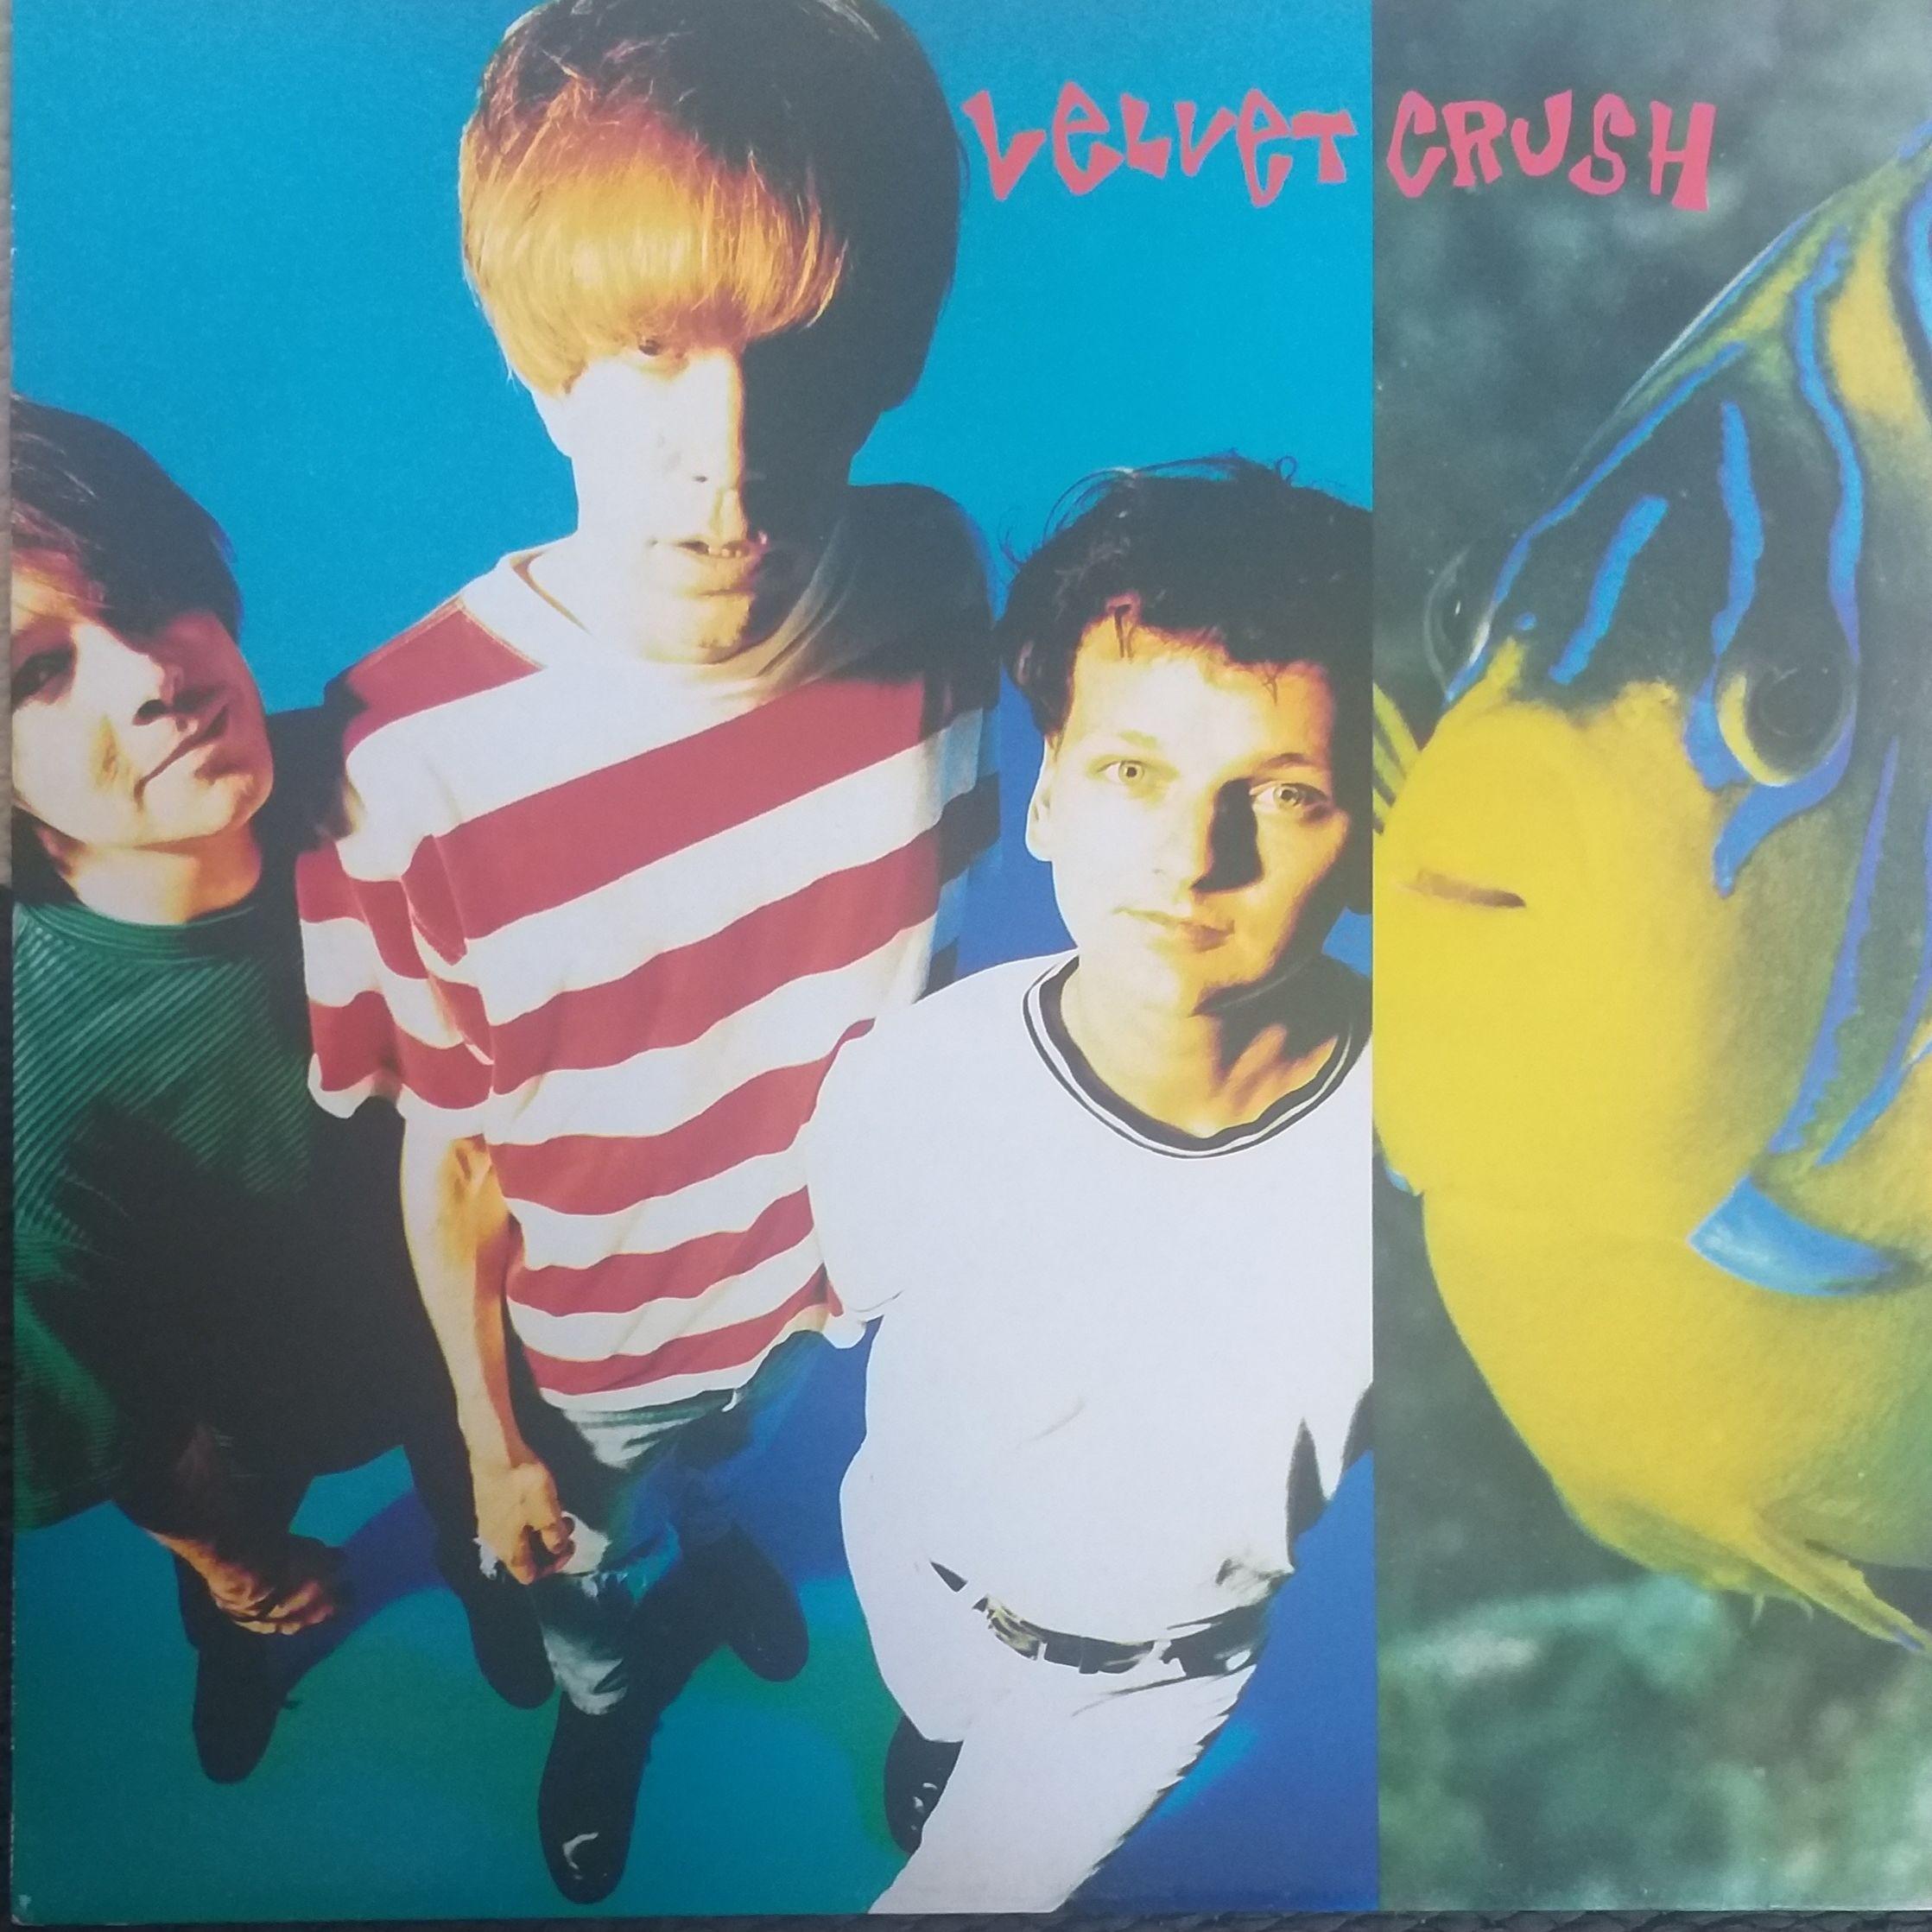 Velvet crush In the presence of greatness LP undefined